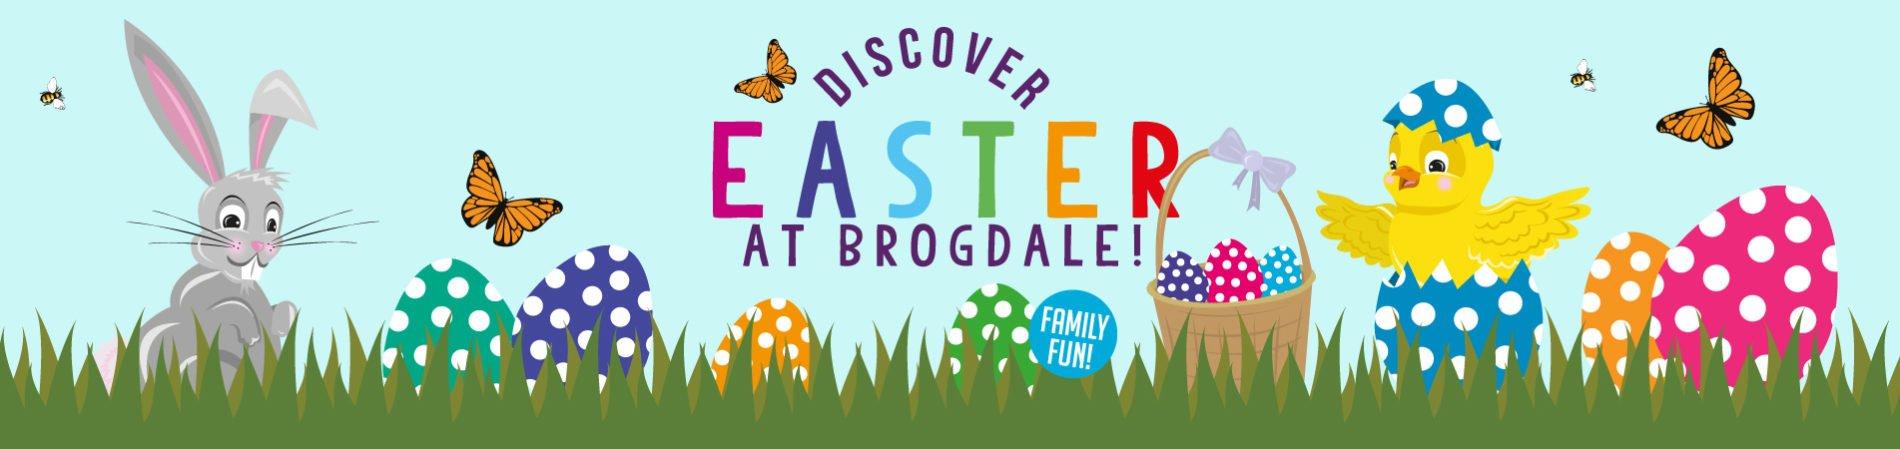 Easter Egg Trail at Brogdale